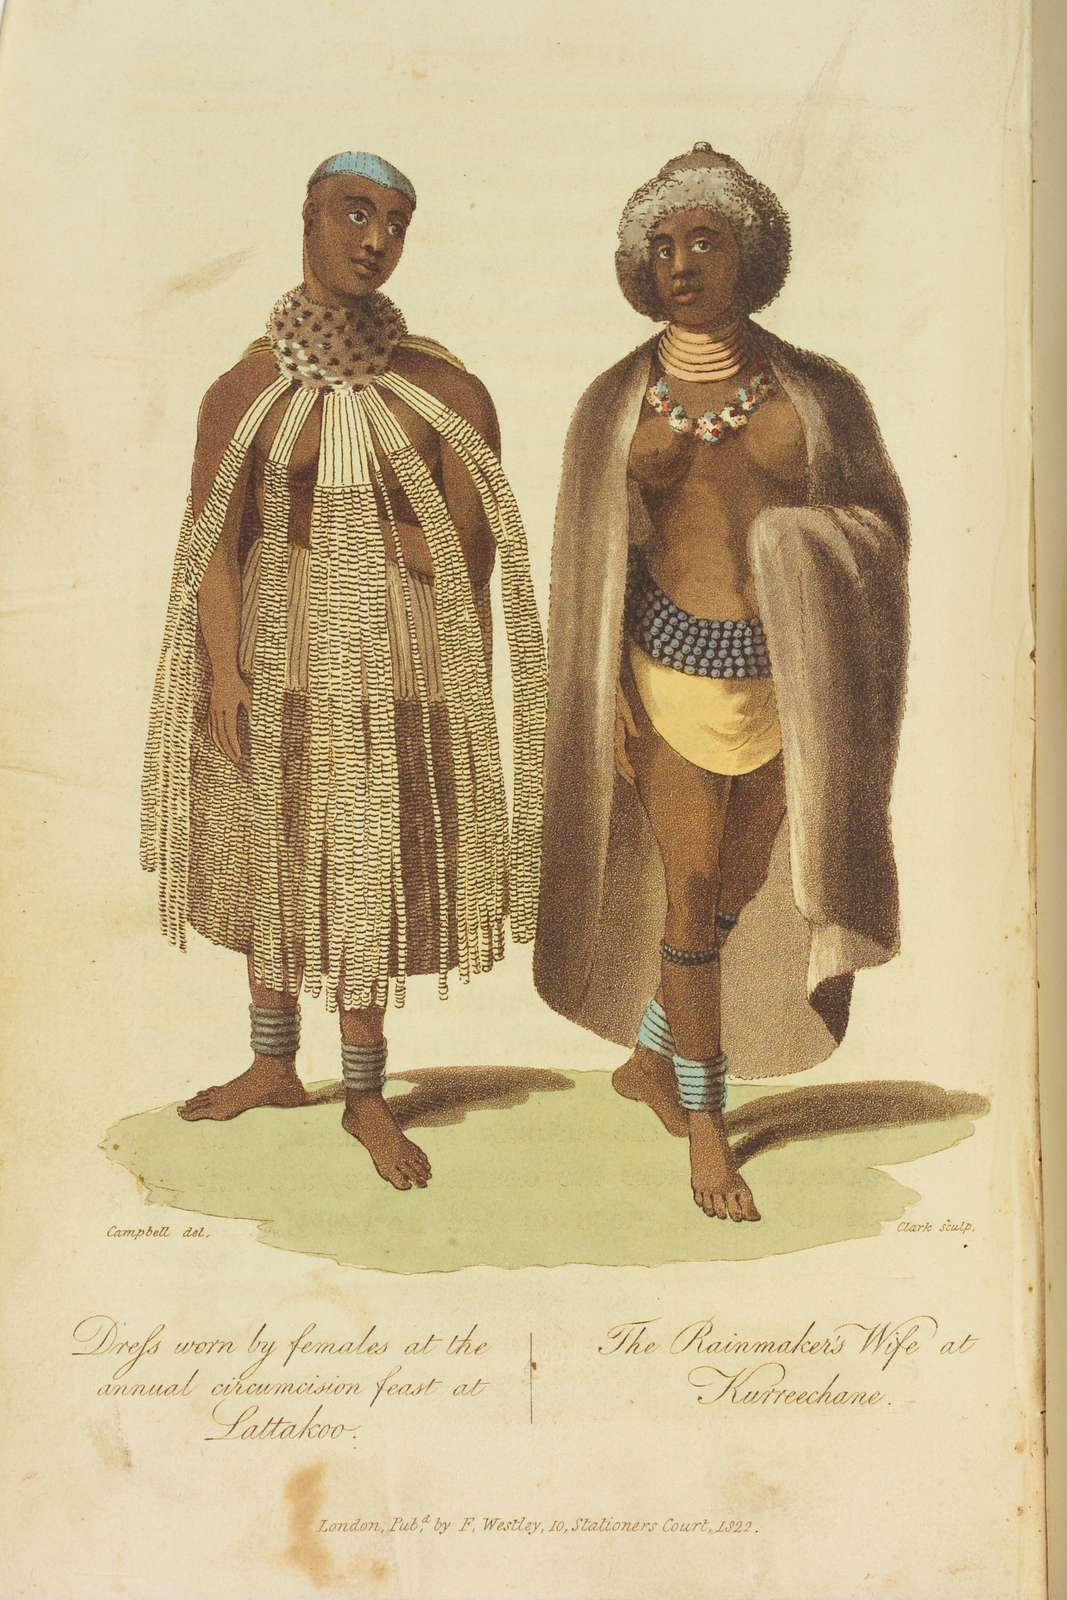 Dress worn by females at the annual circumcision feast at Lattakoo.  The Rainmaker's Wife at Kurreechane.